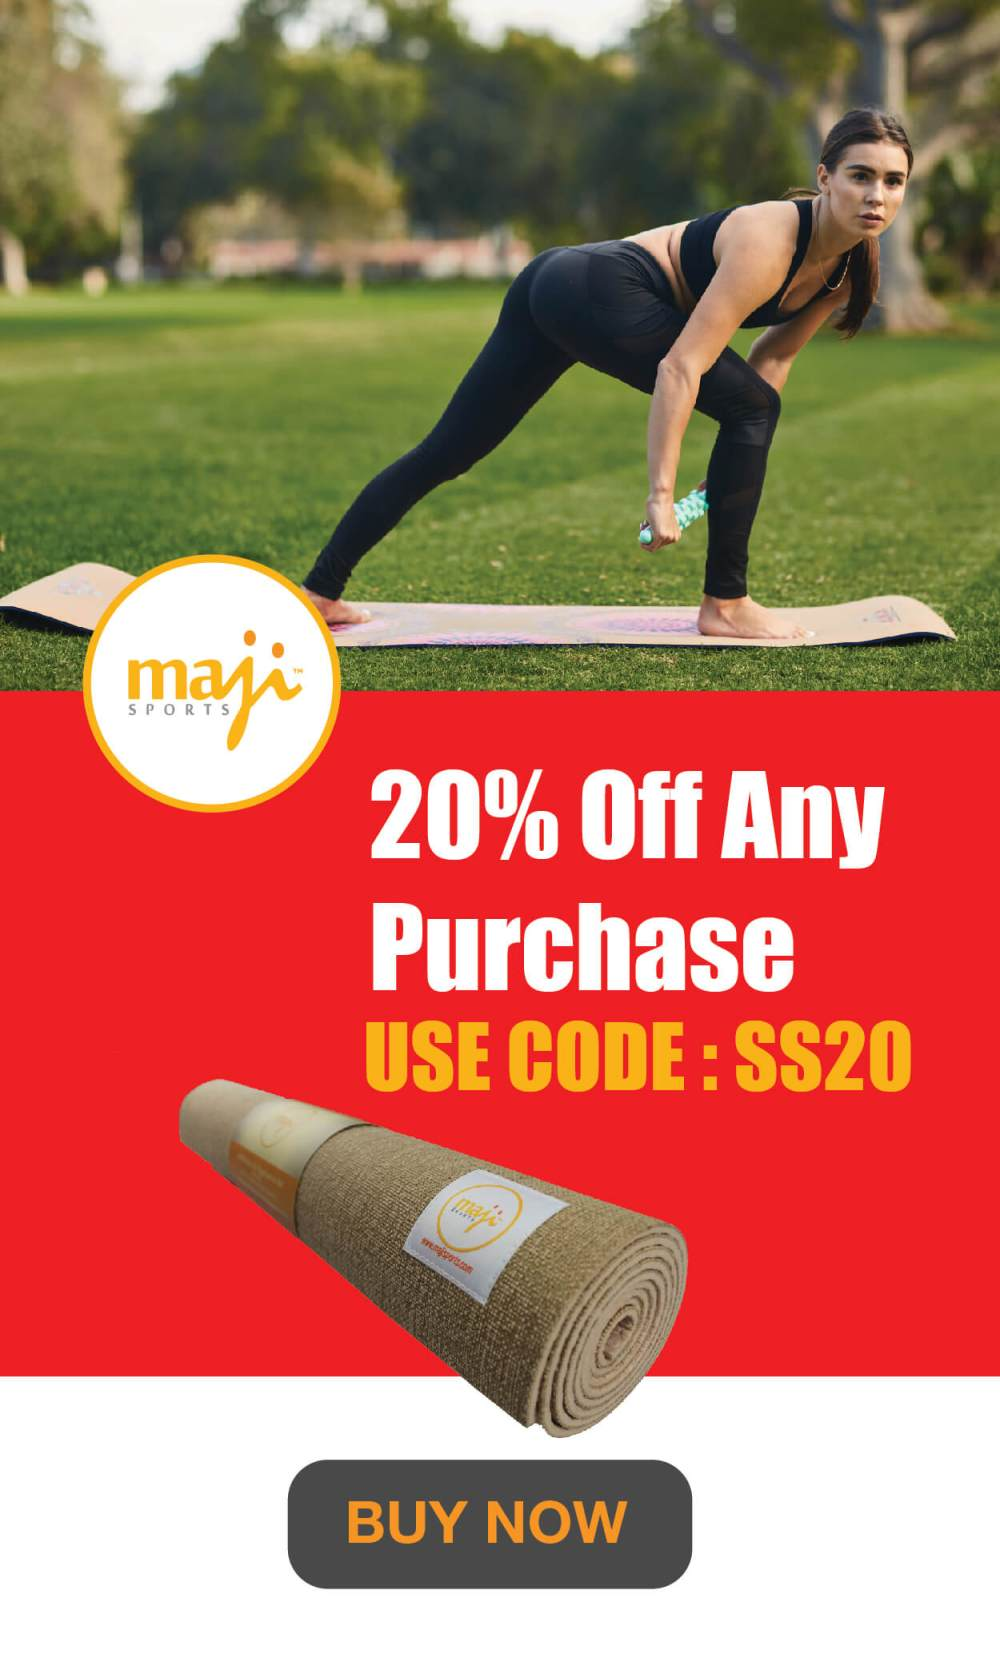 Maji Sports 20% discount